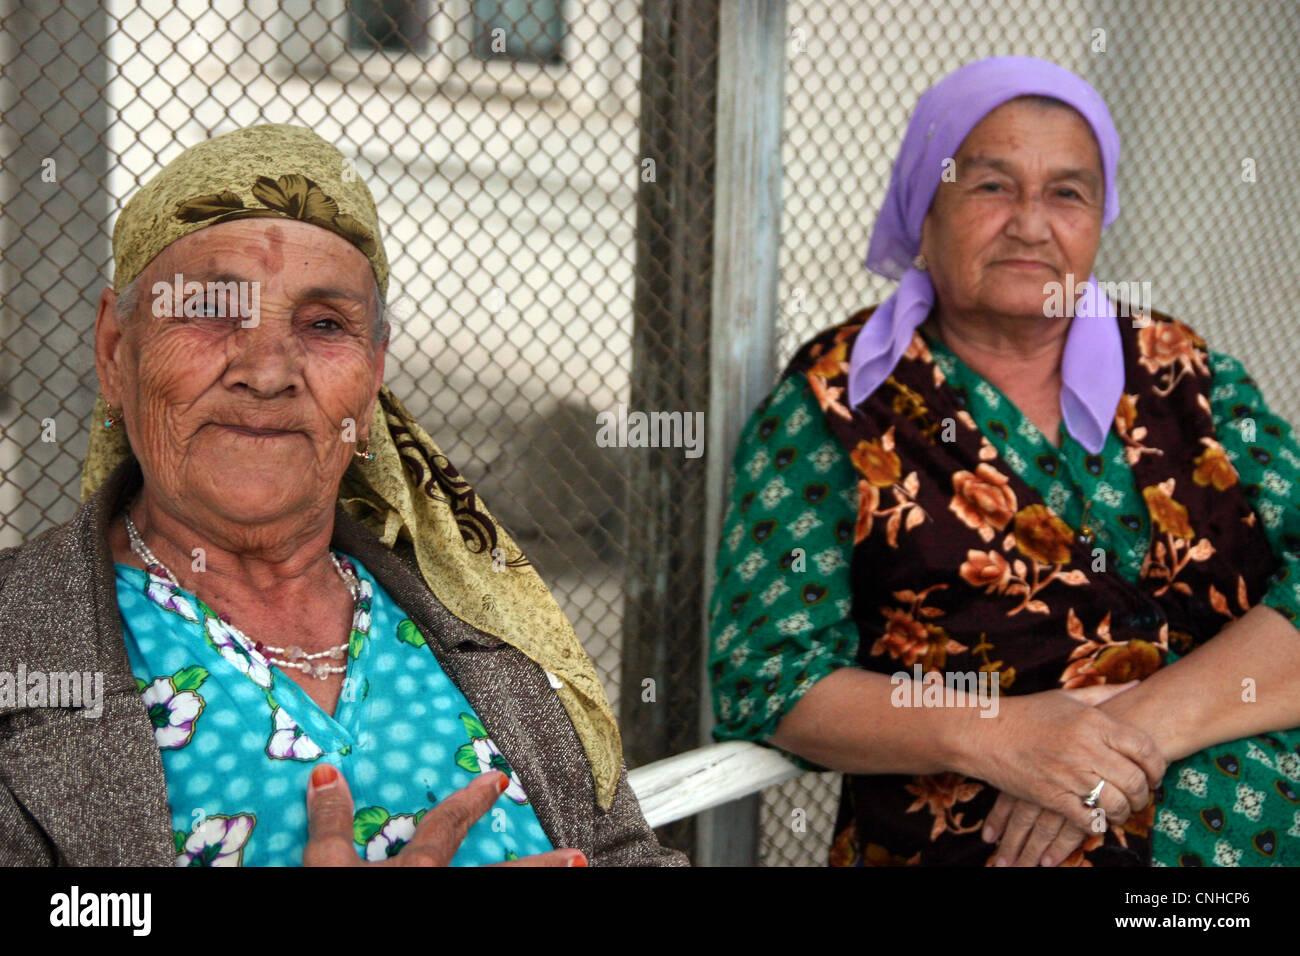 Onorevoli tradizionale in Samarcanda, Uzbekistan Immagini Stock